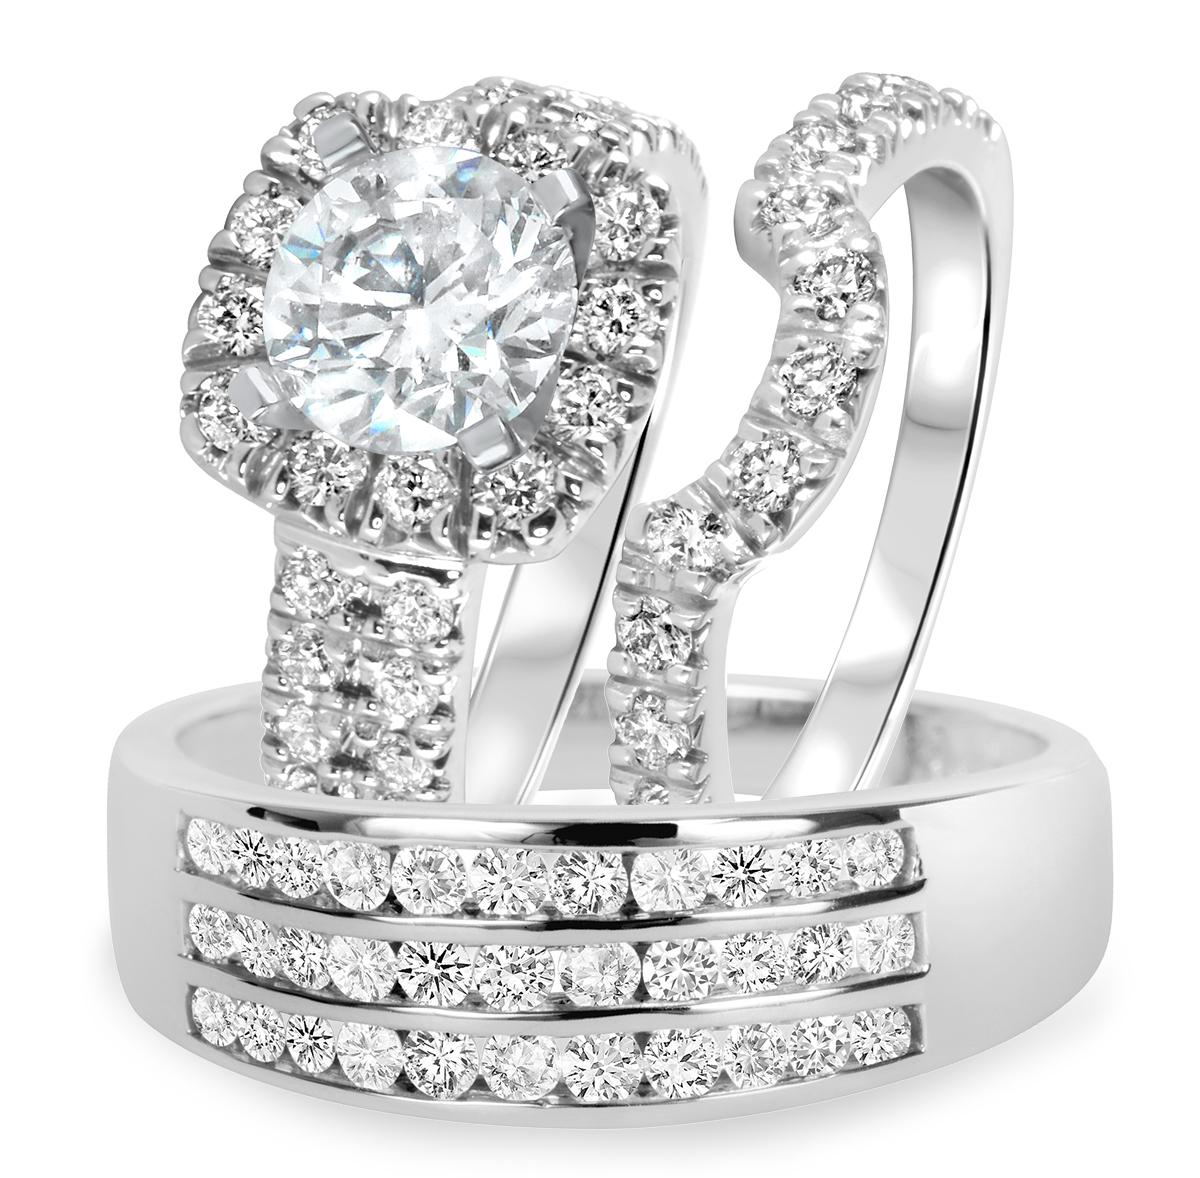 3 CT. T.W. Diamond Ladies Engagement Ring, Wedding Band, Men's Wedding Band